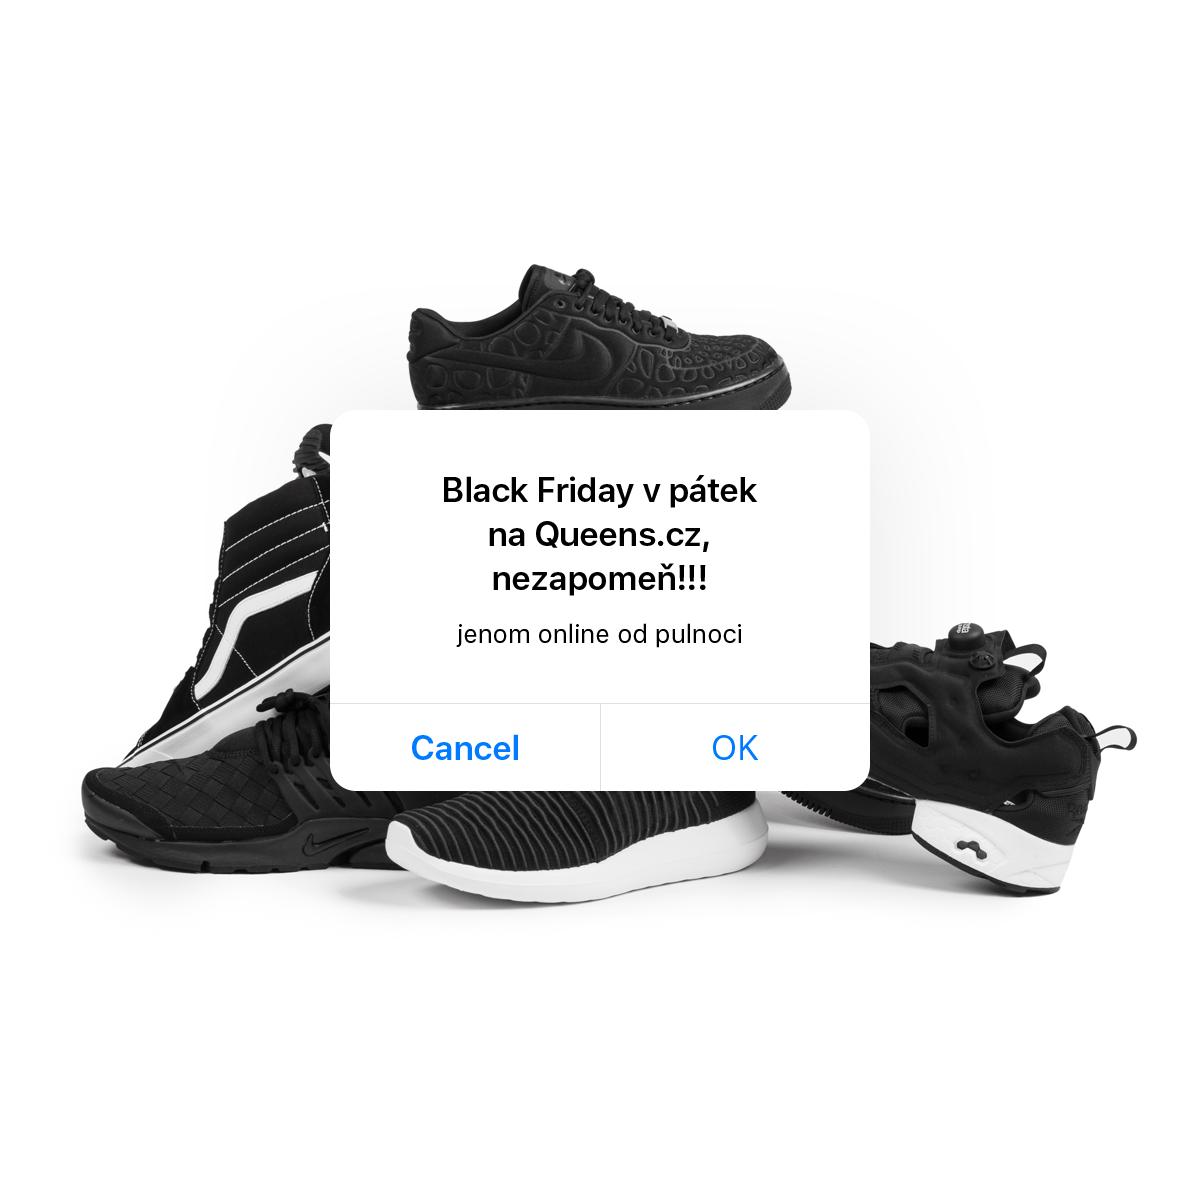 Black Friday zasáhne i Queens už tento pátek!